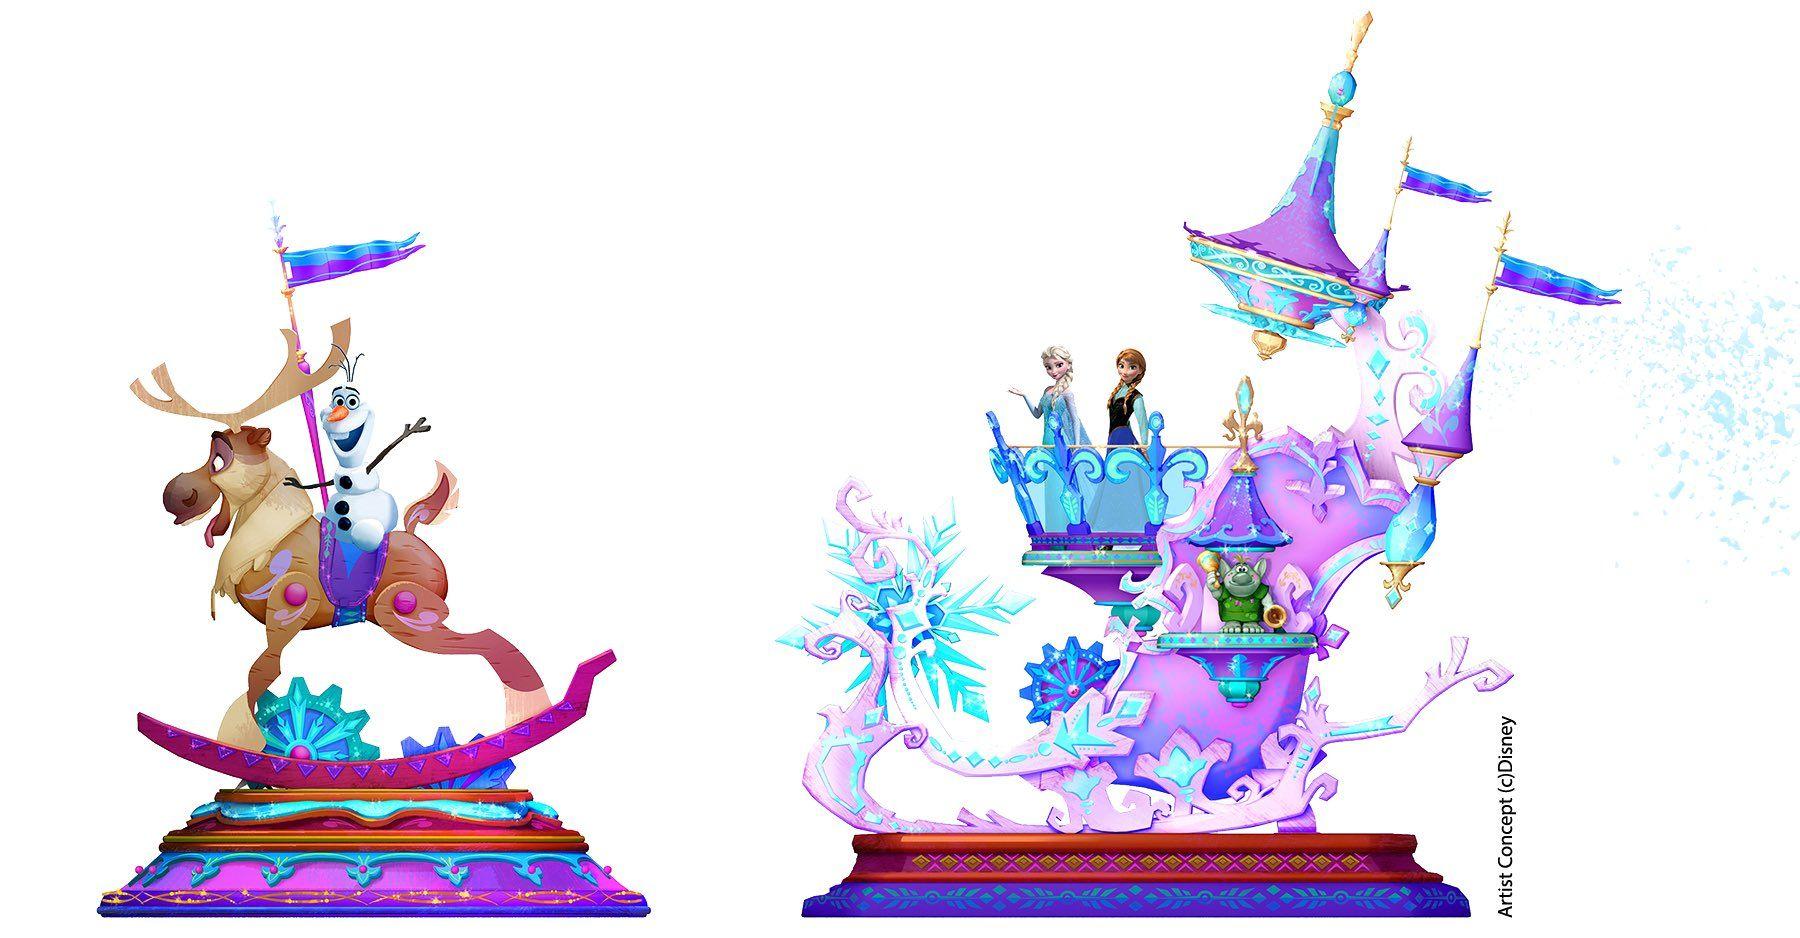 Disneyland clipart parade disney. Concept art released for